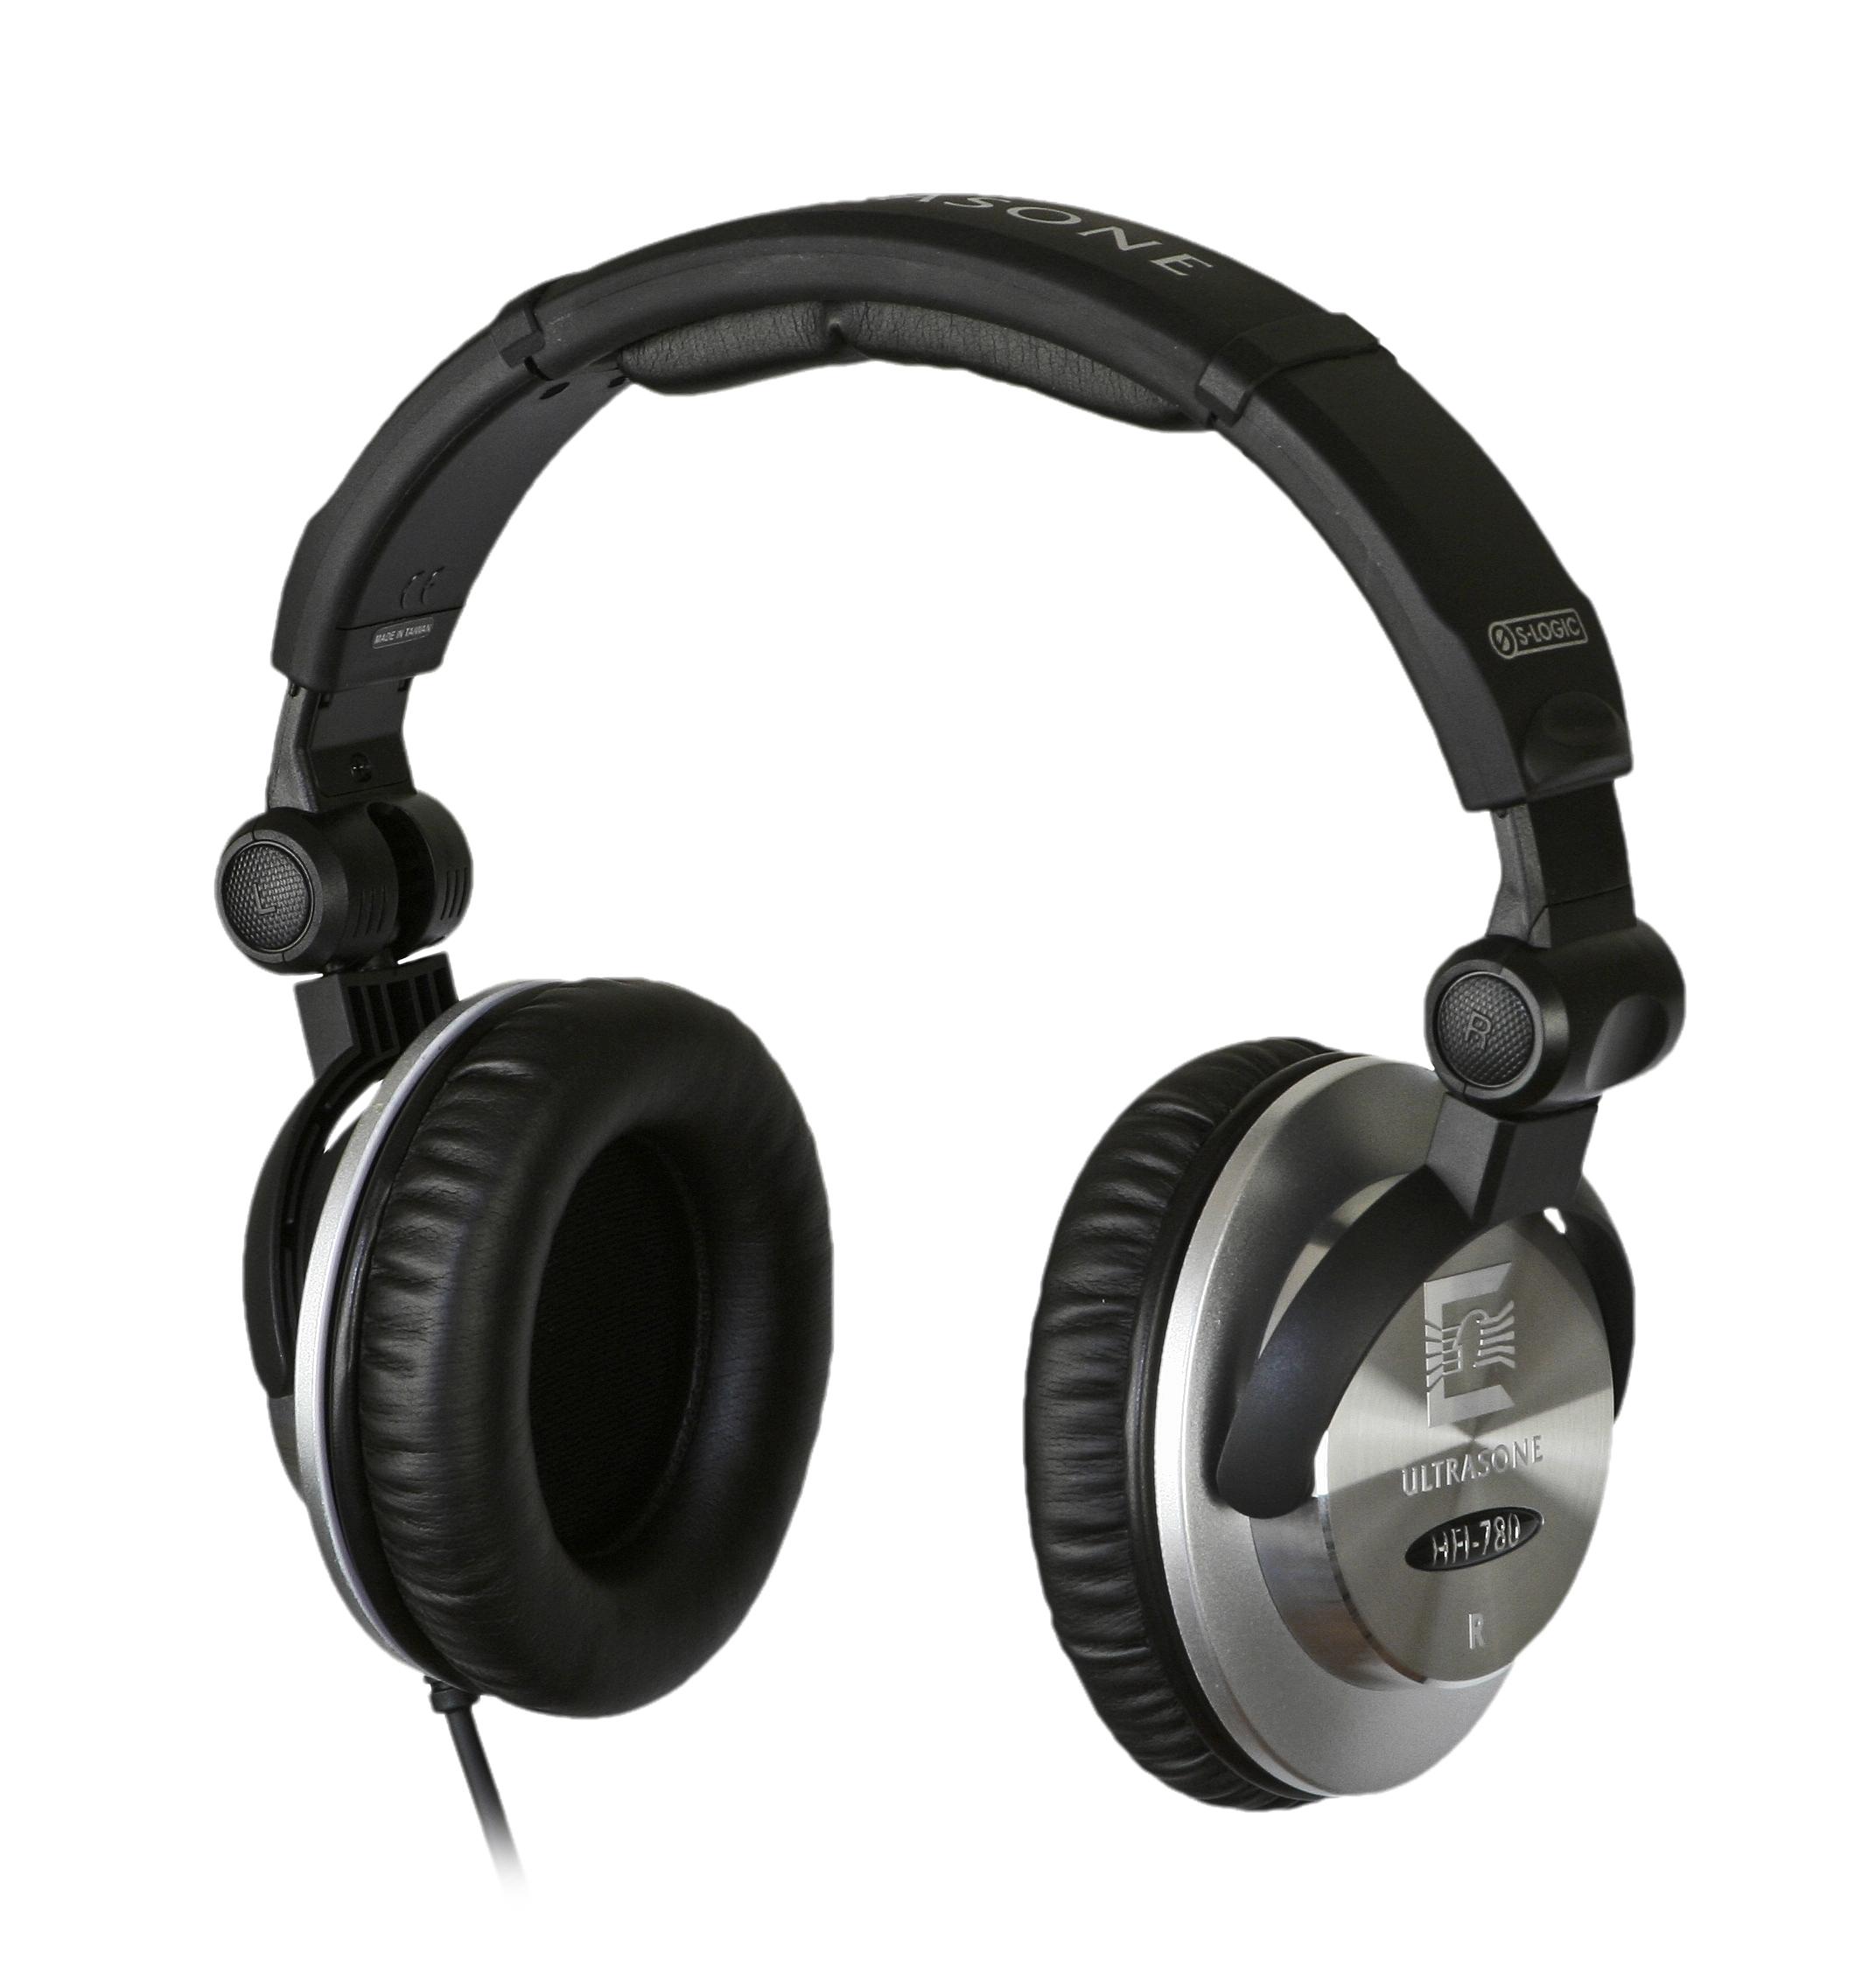 Ultrasone HFI780